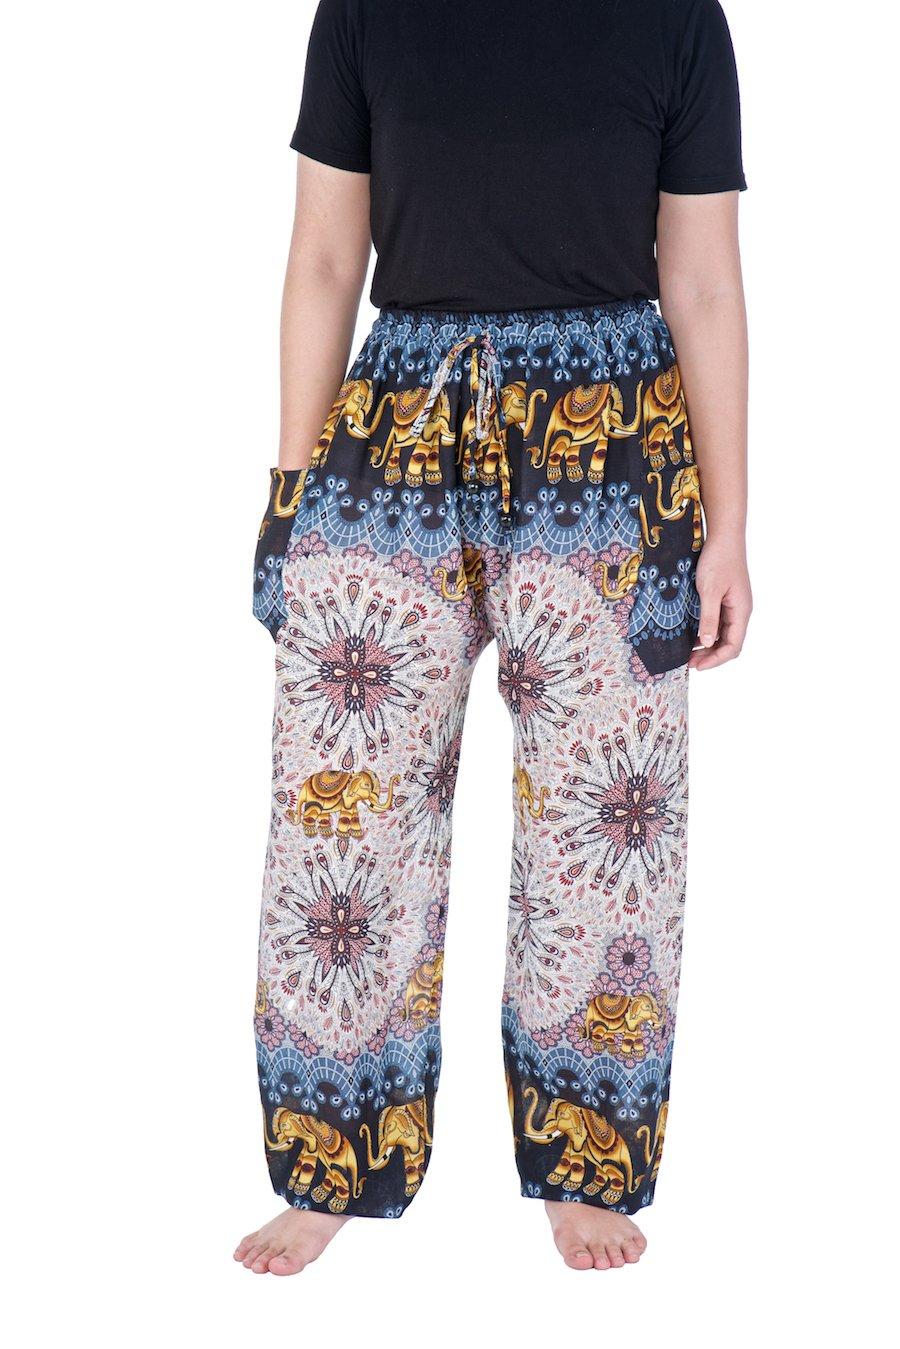 Lannaclothesdesign Drawstring Harem Pants S M L XL XXL Sizes Hippie Lounge Trousers (S, Black Elephant Mandala)